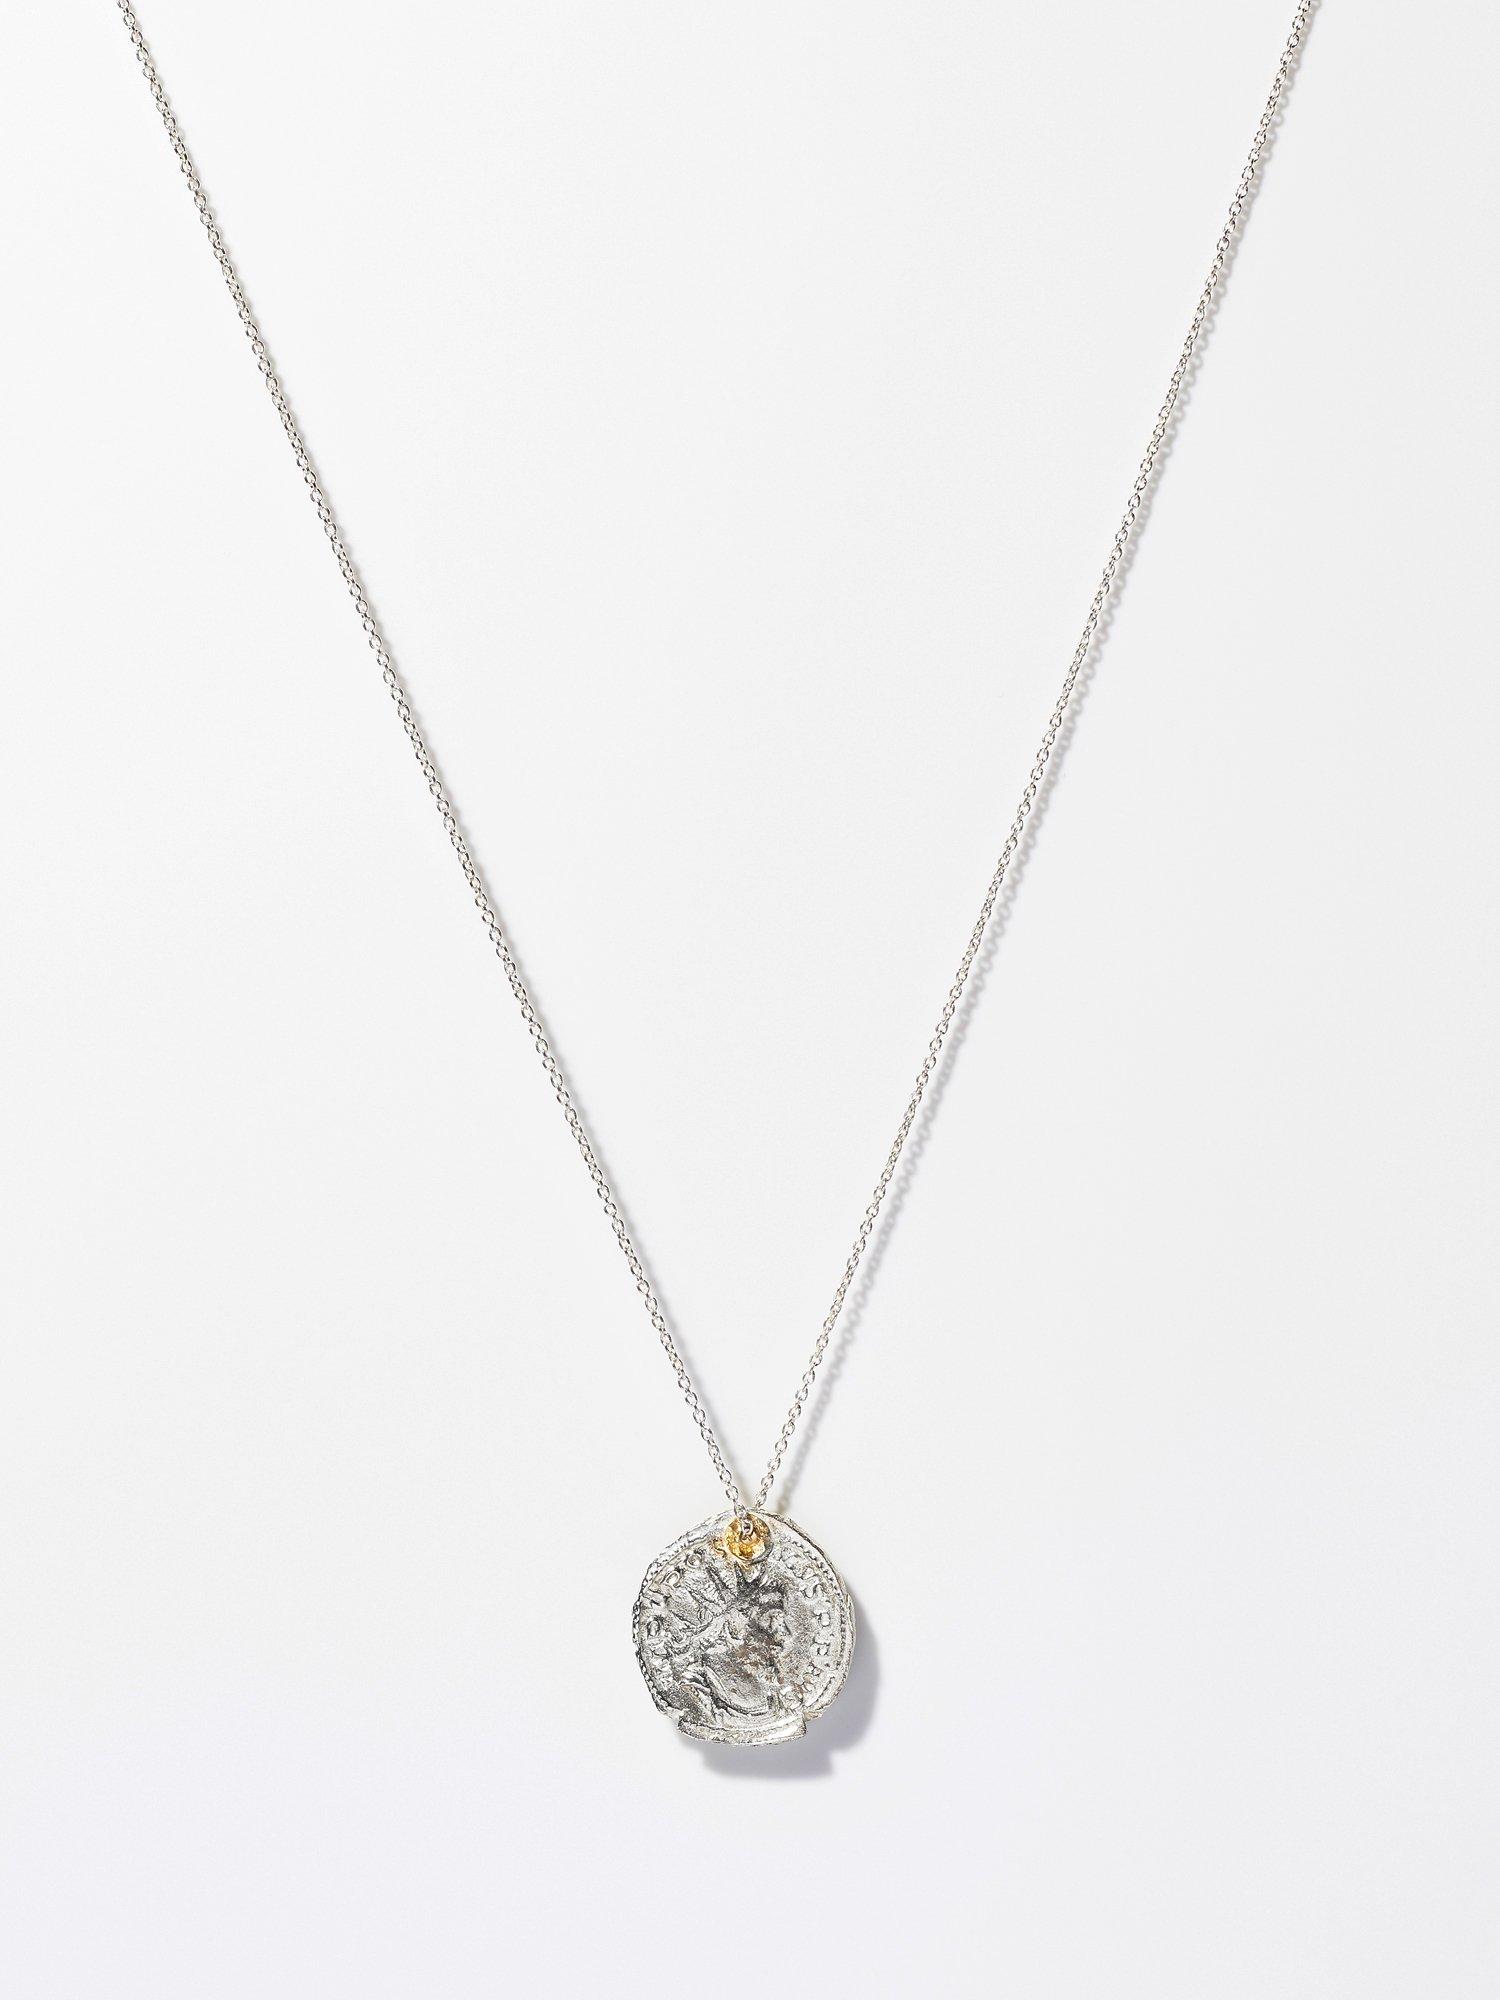 ARTEMIS / Roman coin necklace / ANTONINIANA / 在庫商品